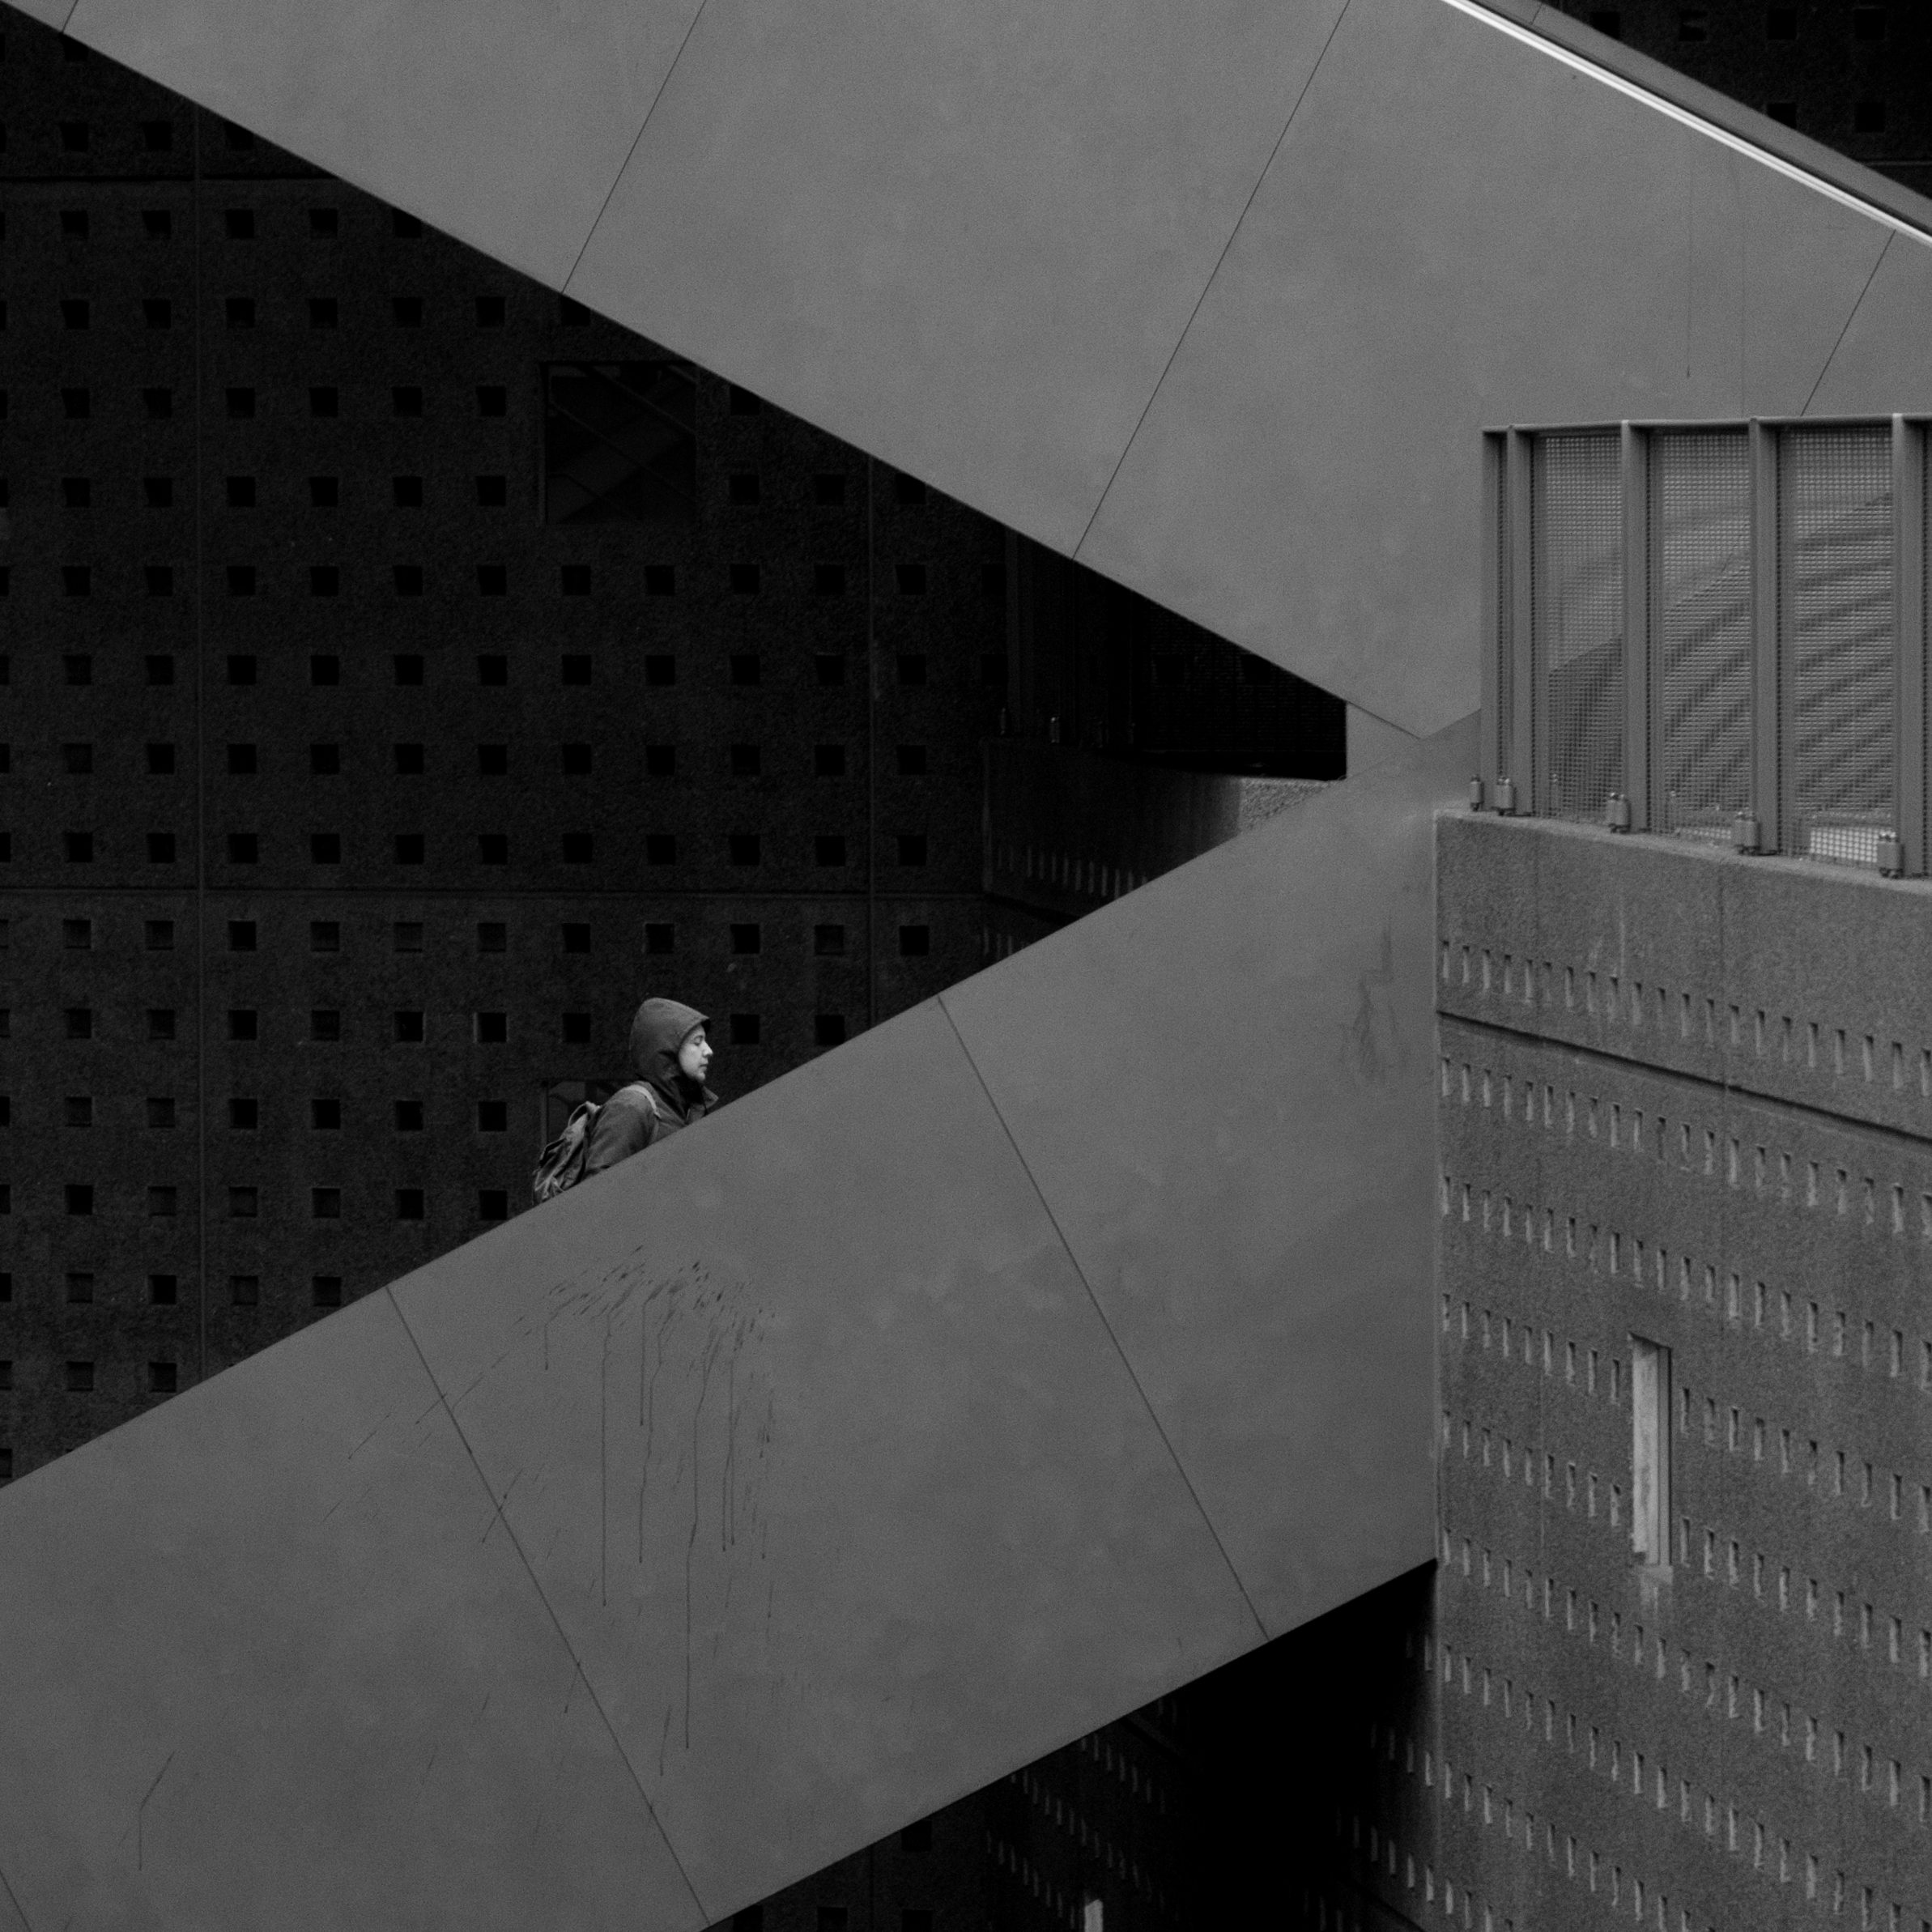 station atwerpen-5.jpg